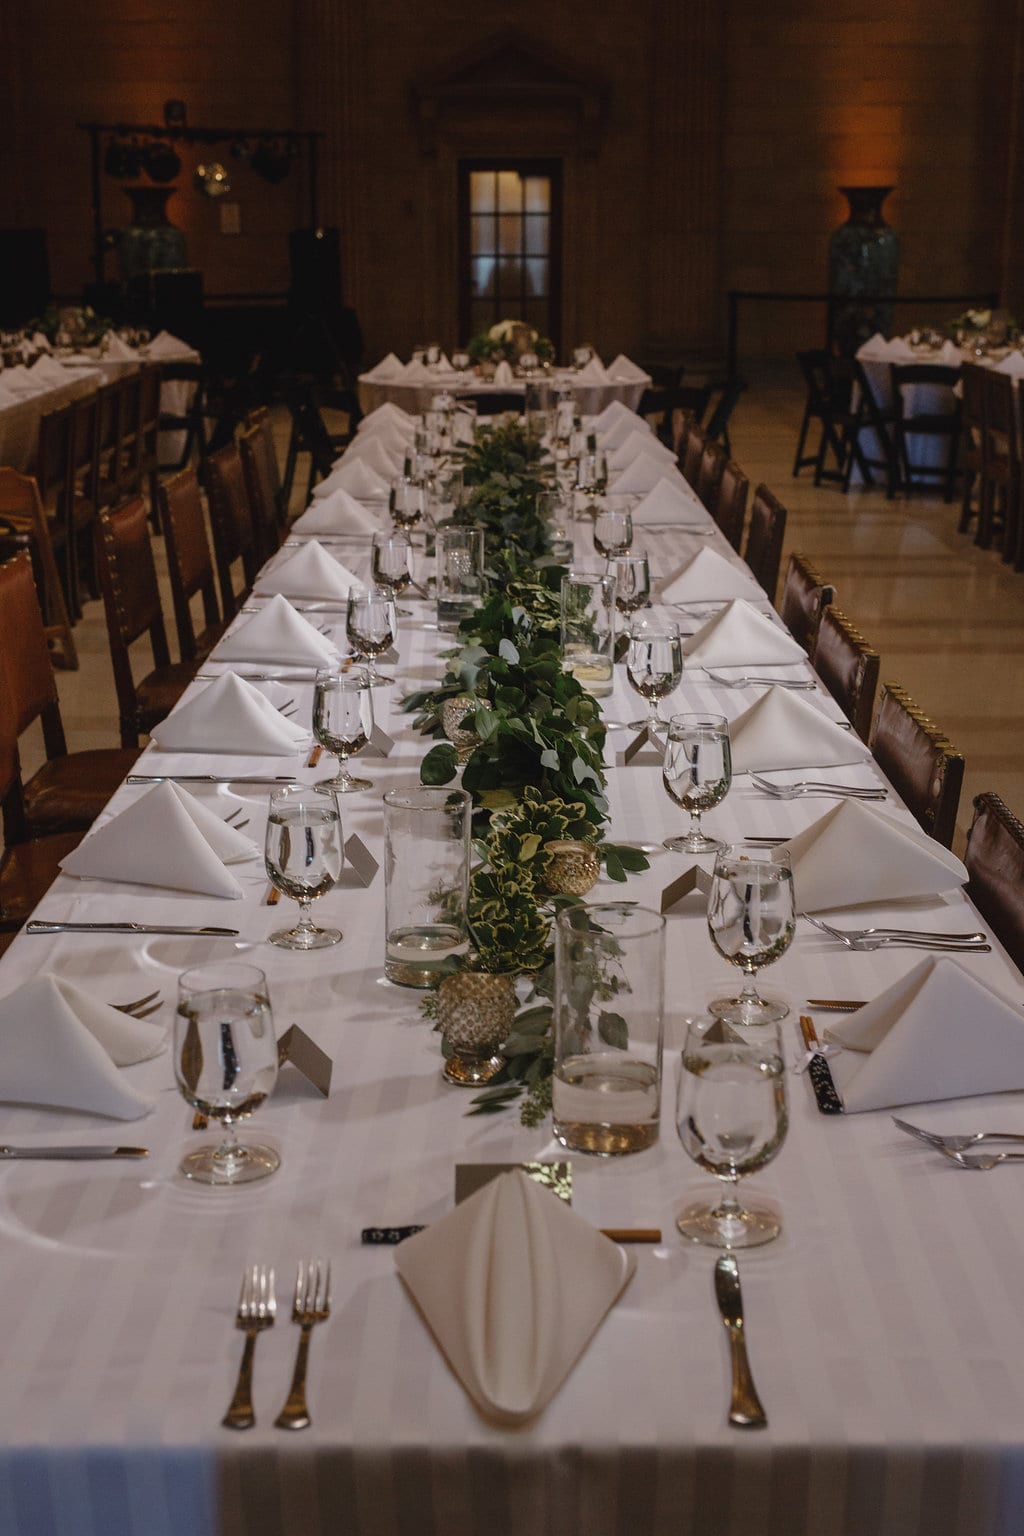 James J Hill Center, Cadence and Eli Photography, wedding flowers, floral, library wedding, Minnesota wedding venues, Minneapolis wedding florist, Saint Paul wedding florist, Artemisia Studios, cream and green wedding floral